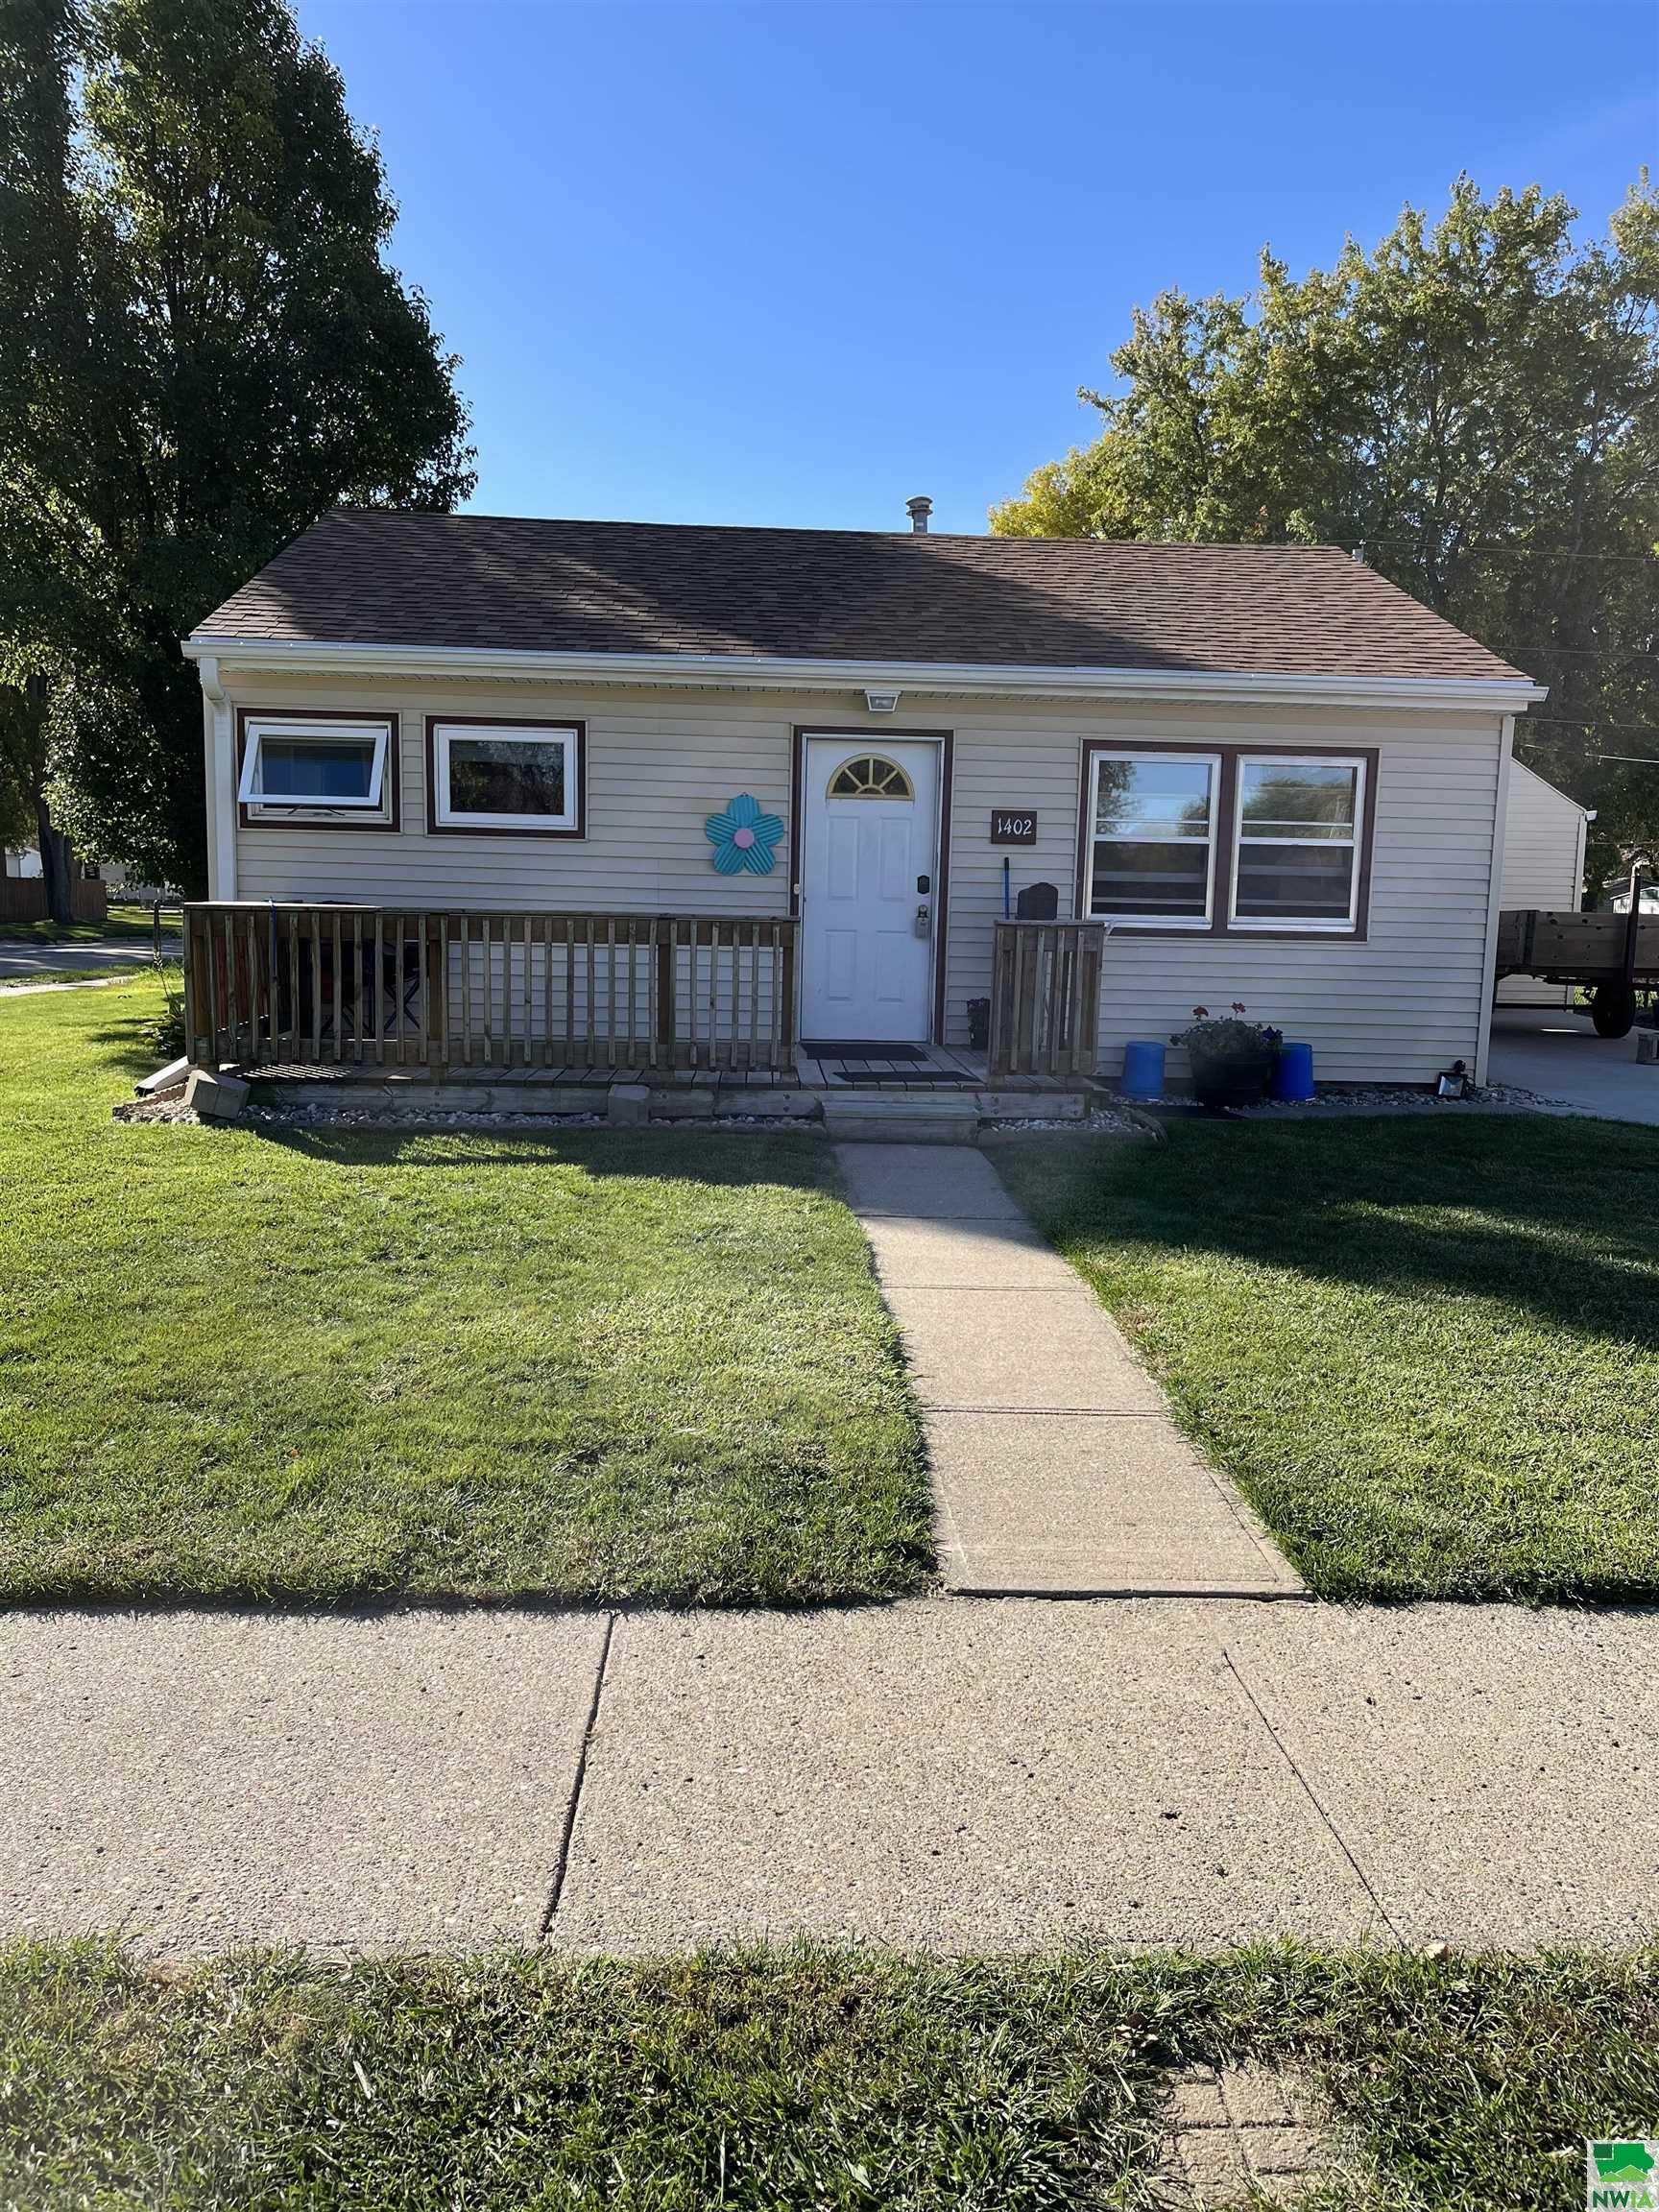 1402 Whitcher Ave, Sioux City, Iowa 51109